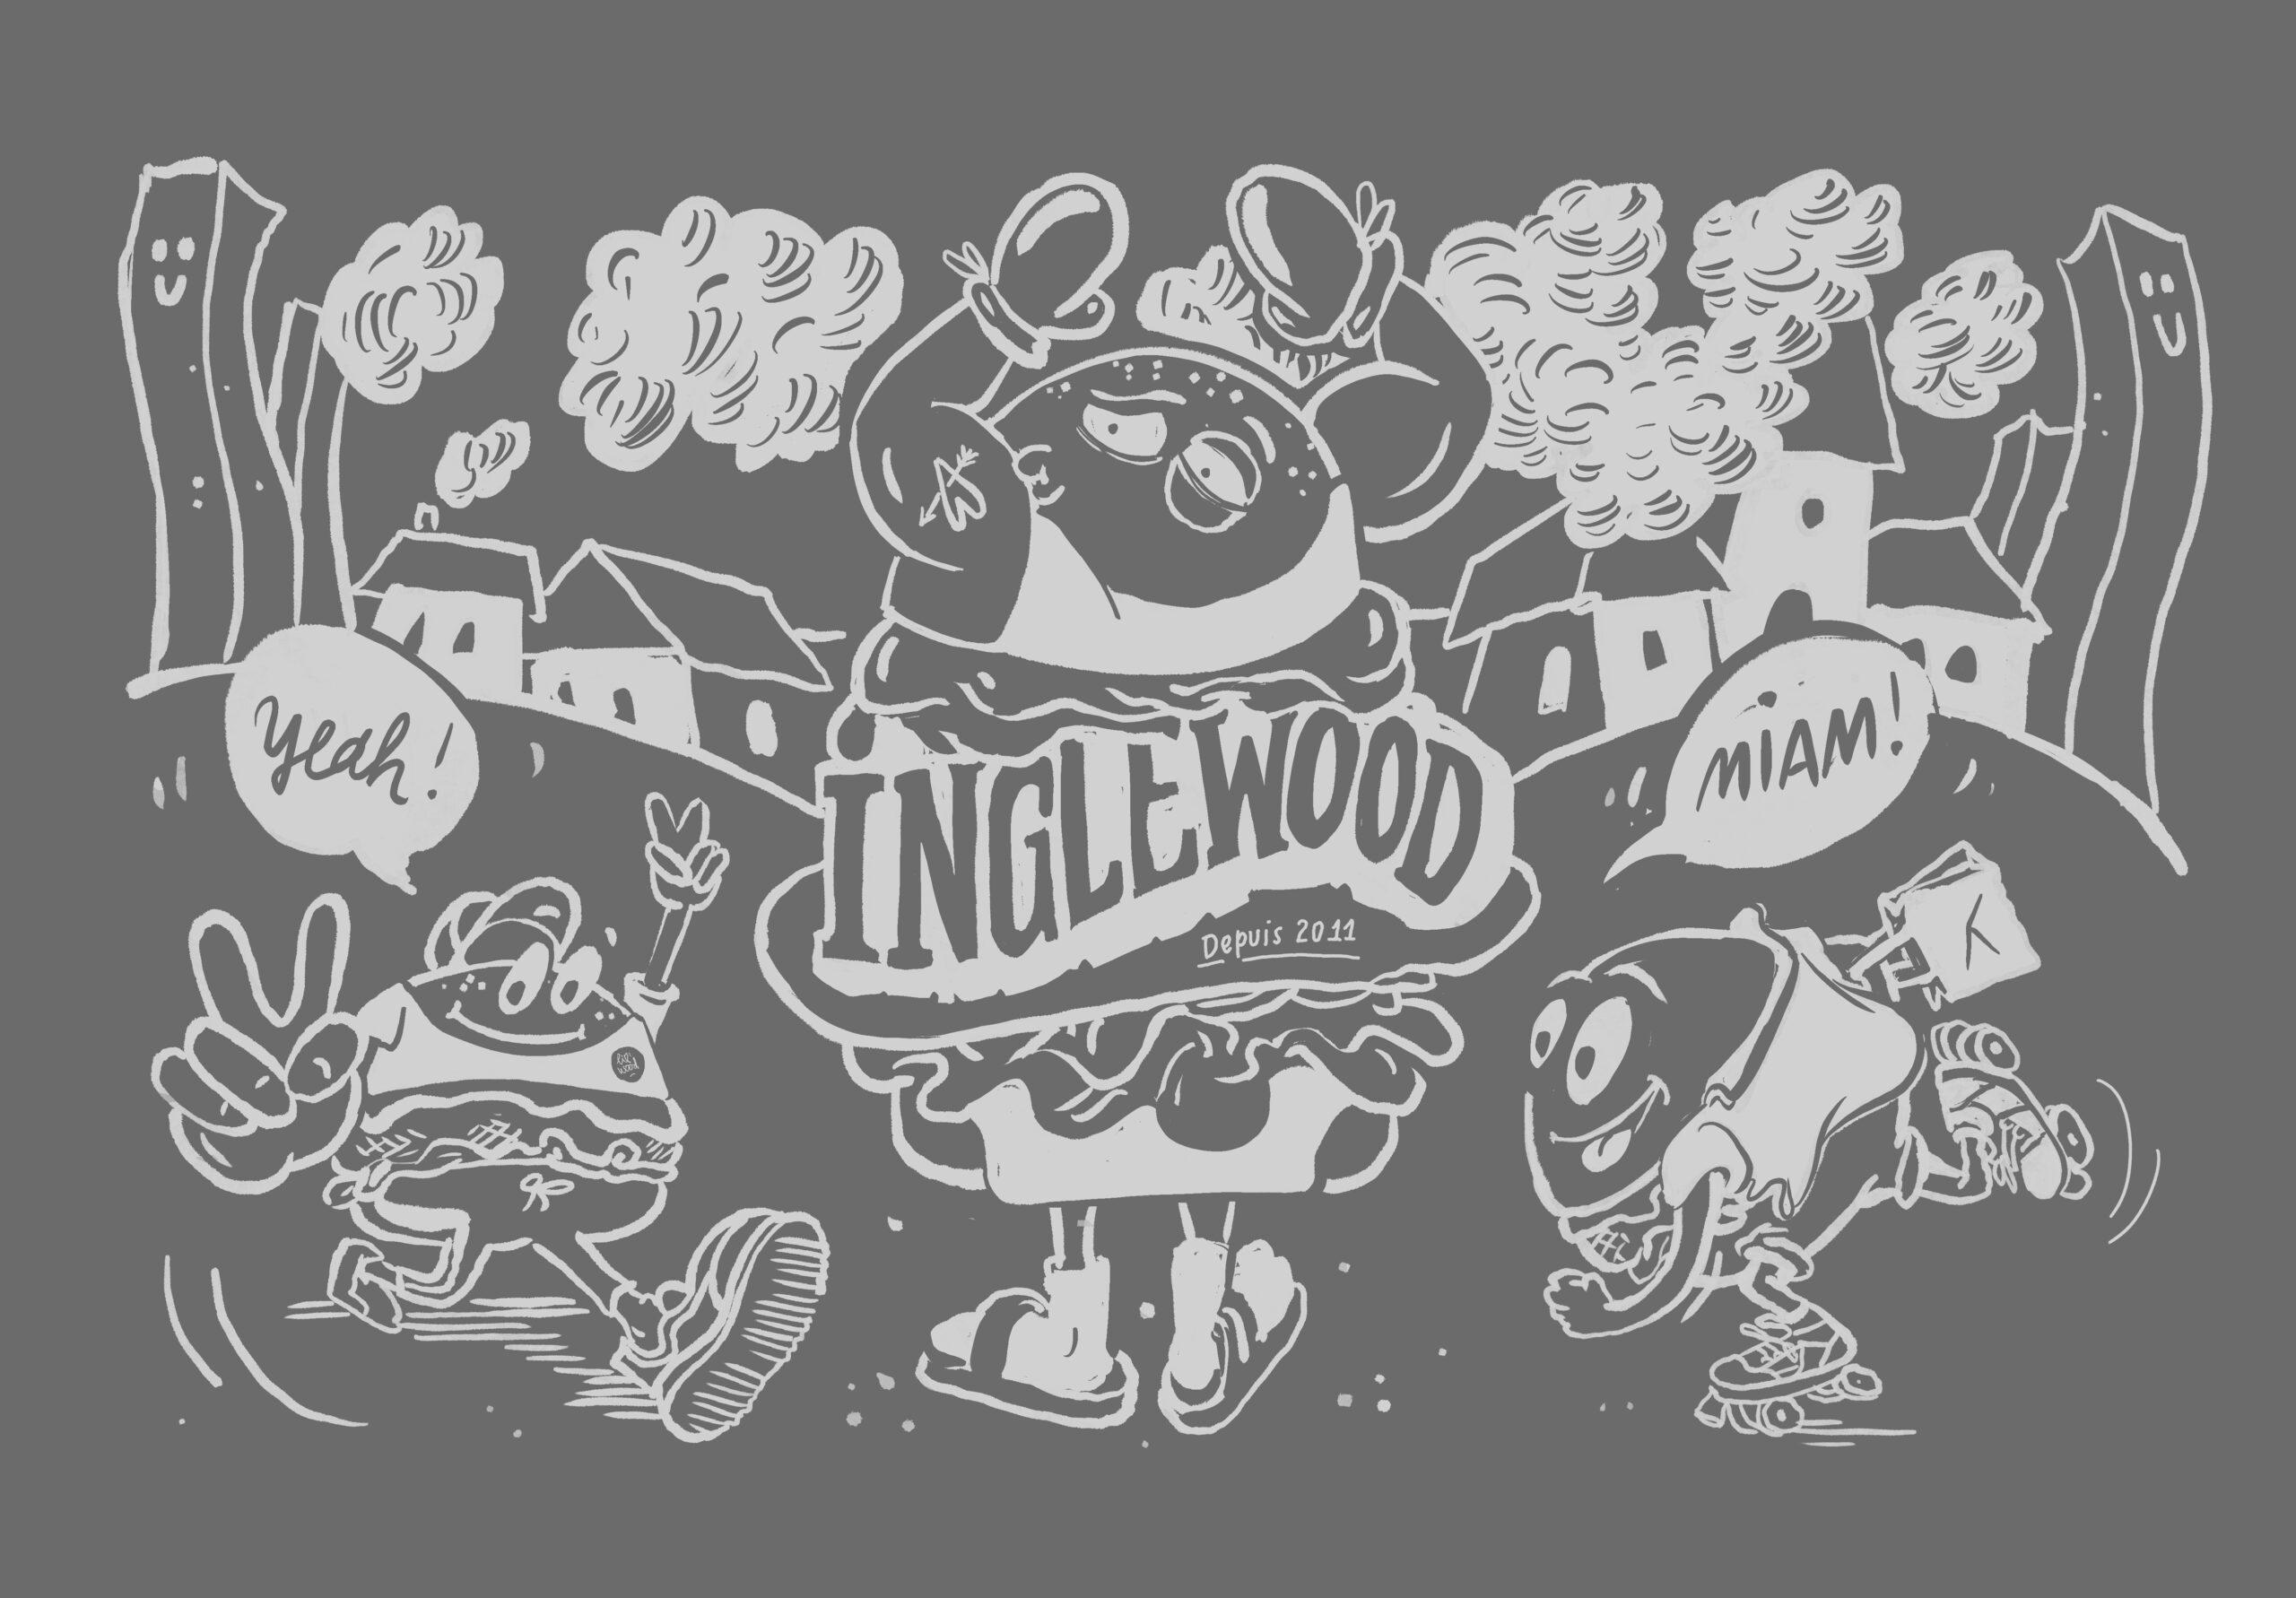 (c) Inglewood.ch